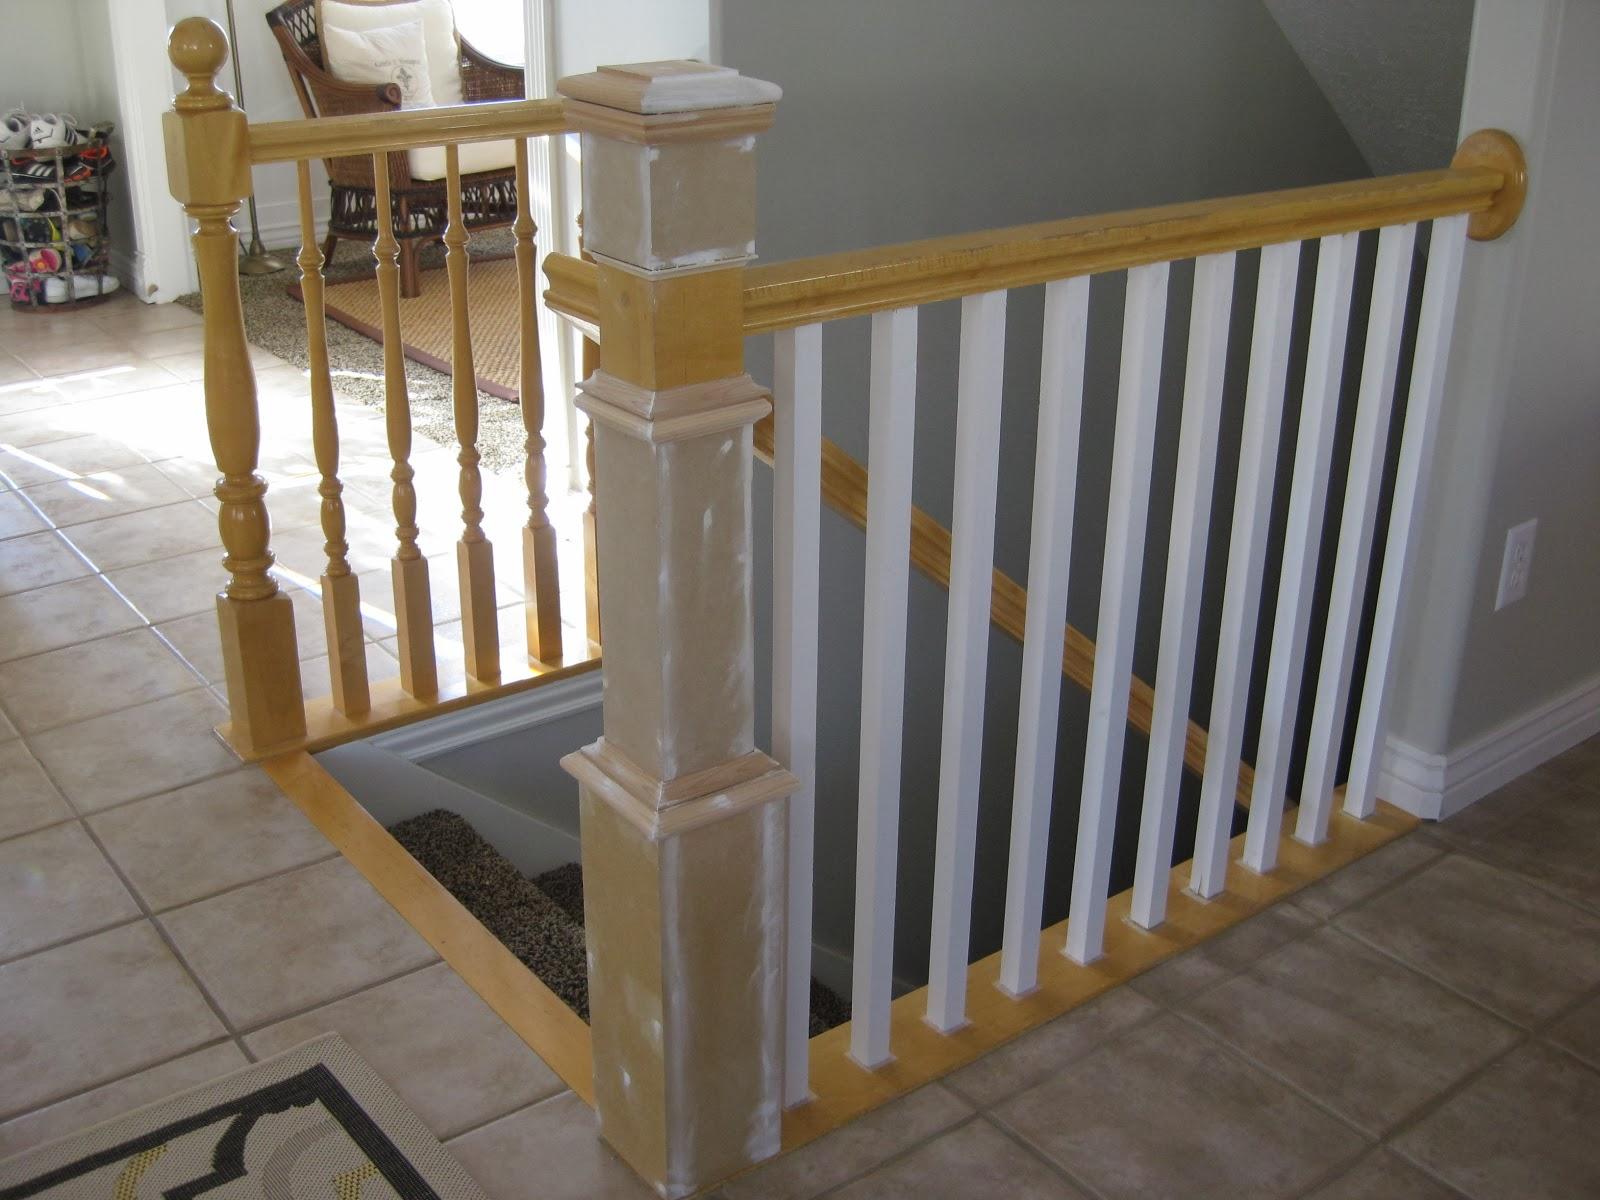 TDA decorating and design: DIY Stair Banister Tutorial ...